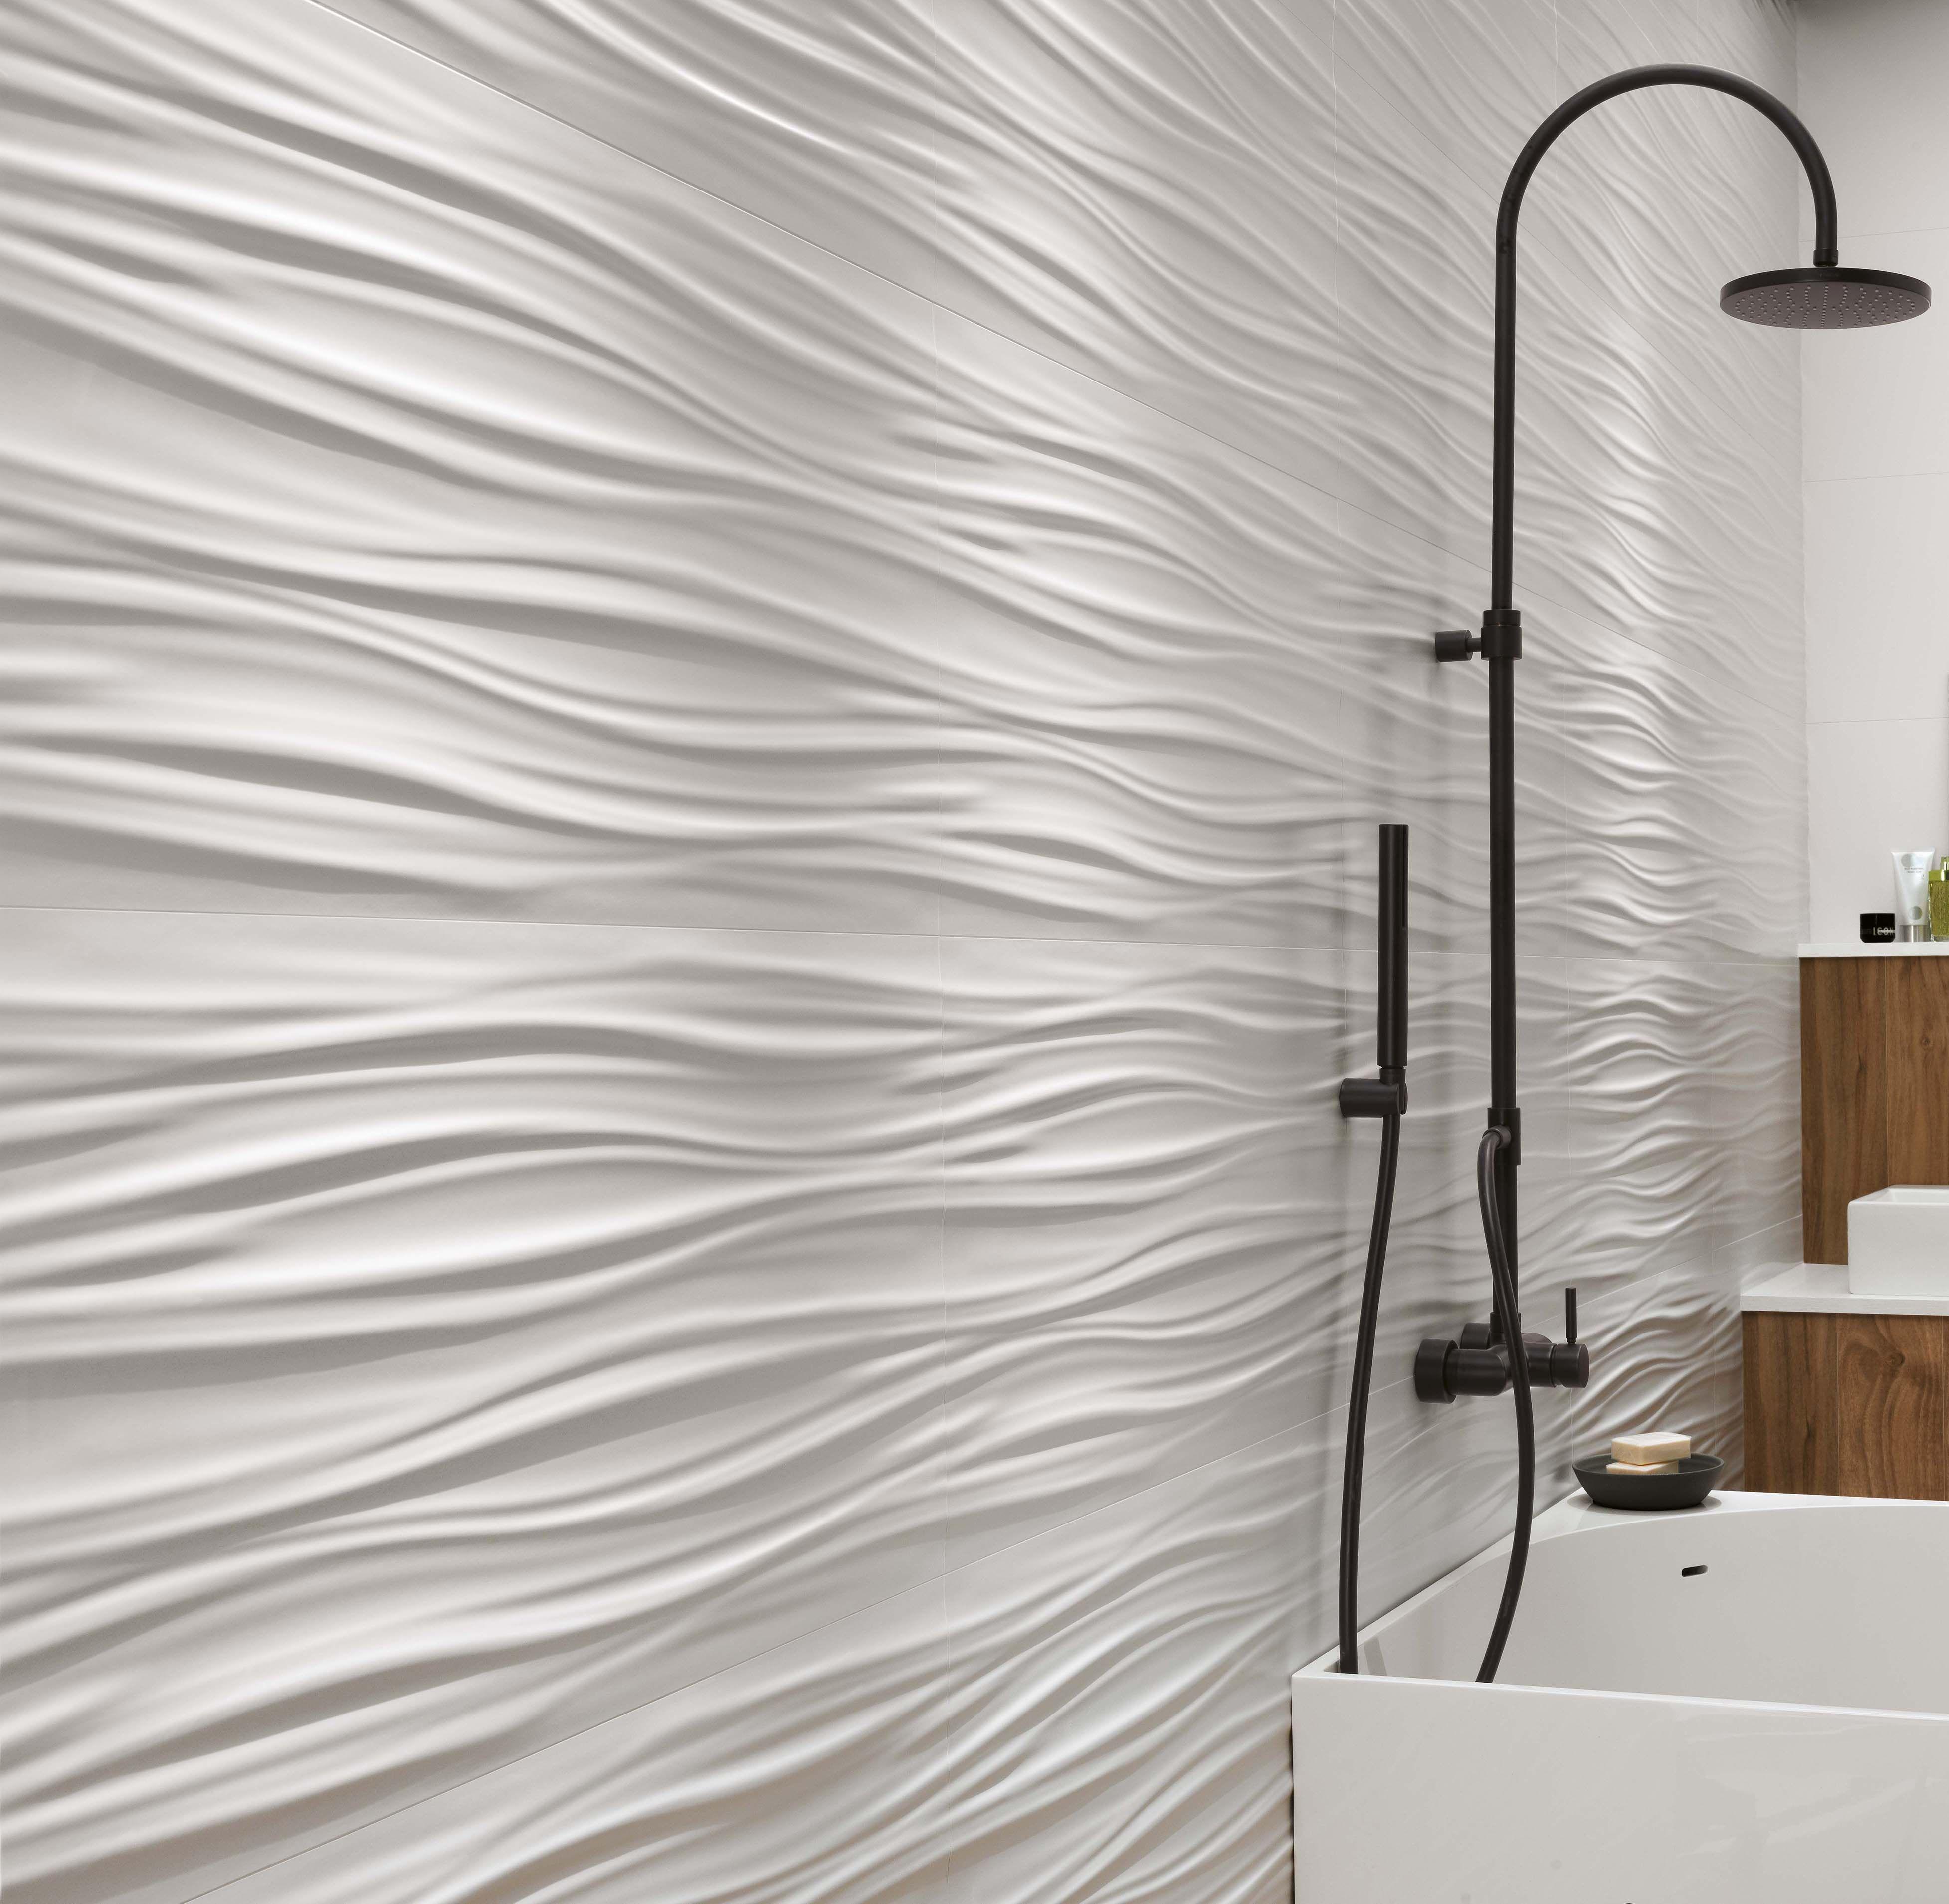 Amazing 12X12 Ceramic Tile Home Depot Big 12X12 Vinyl Floor Tile Round 12X24 Ceramic Tile Patterns 13X13 Floor Tile Old 2 By 2 Ceiling Tiles Black2 X 12 Subway Tile Image Result For 3d Ceramic Wall Tiles In Bathrooms | Bathroom ..